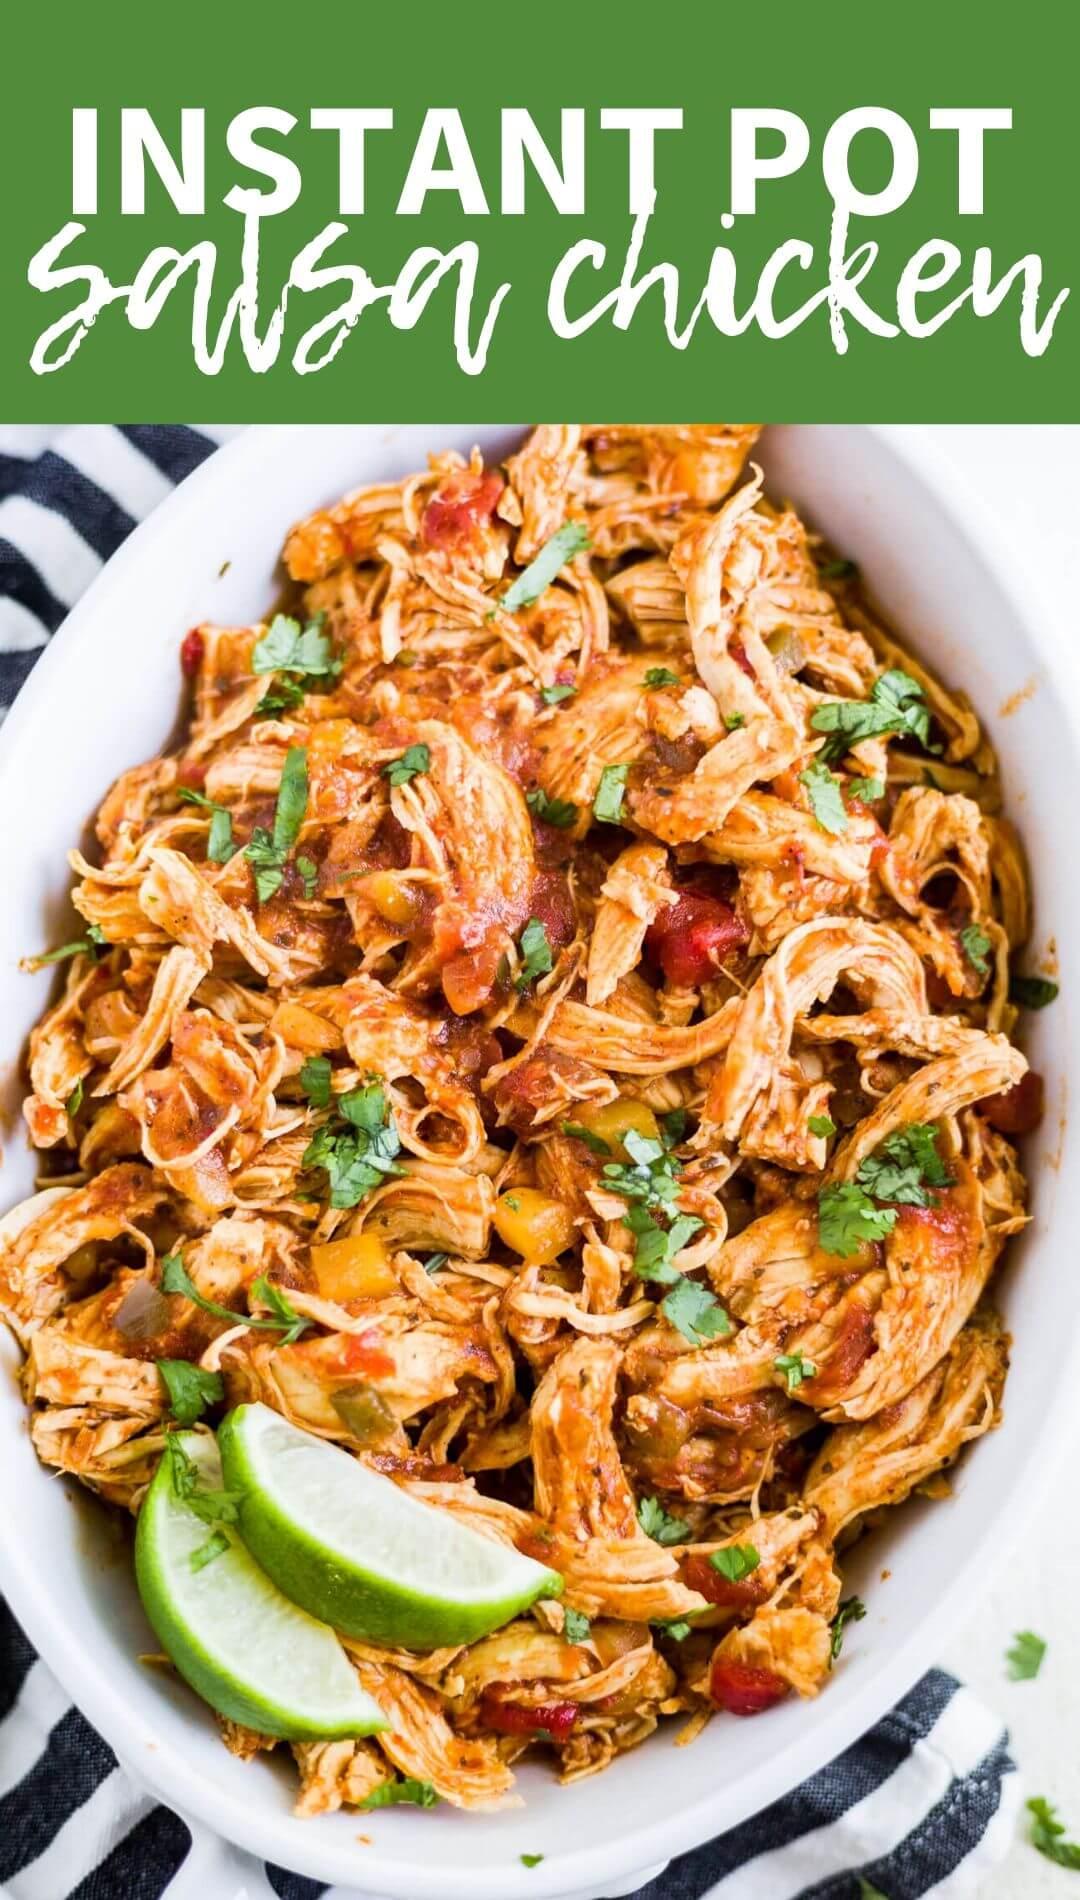 salsa chicken recipe instant pot